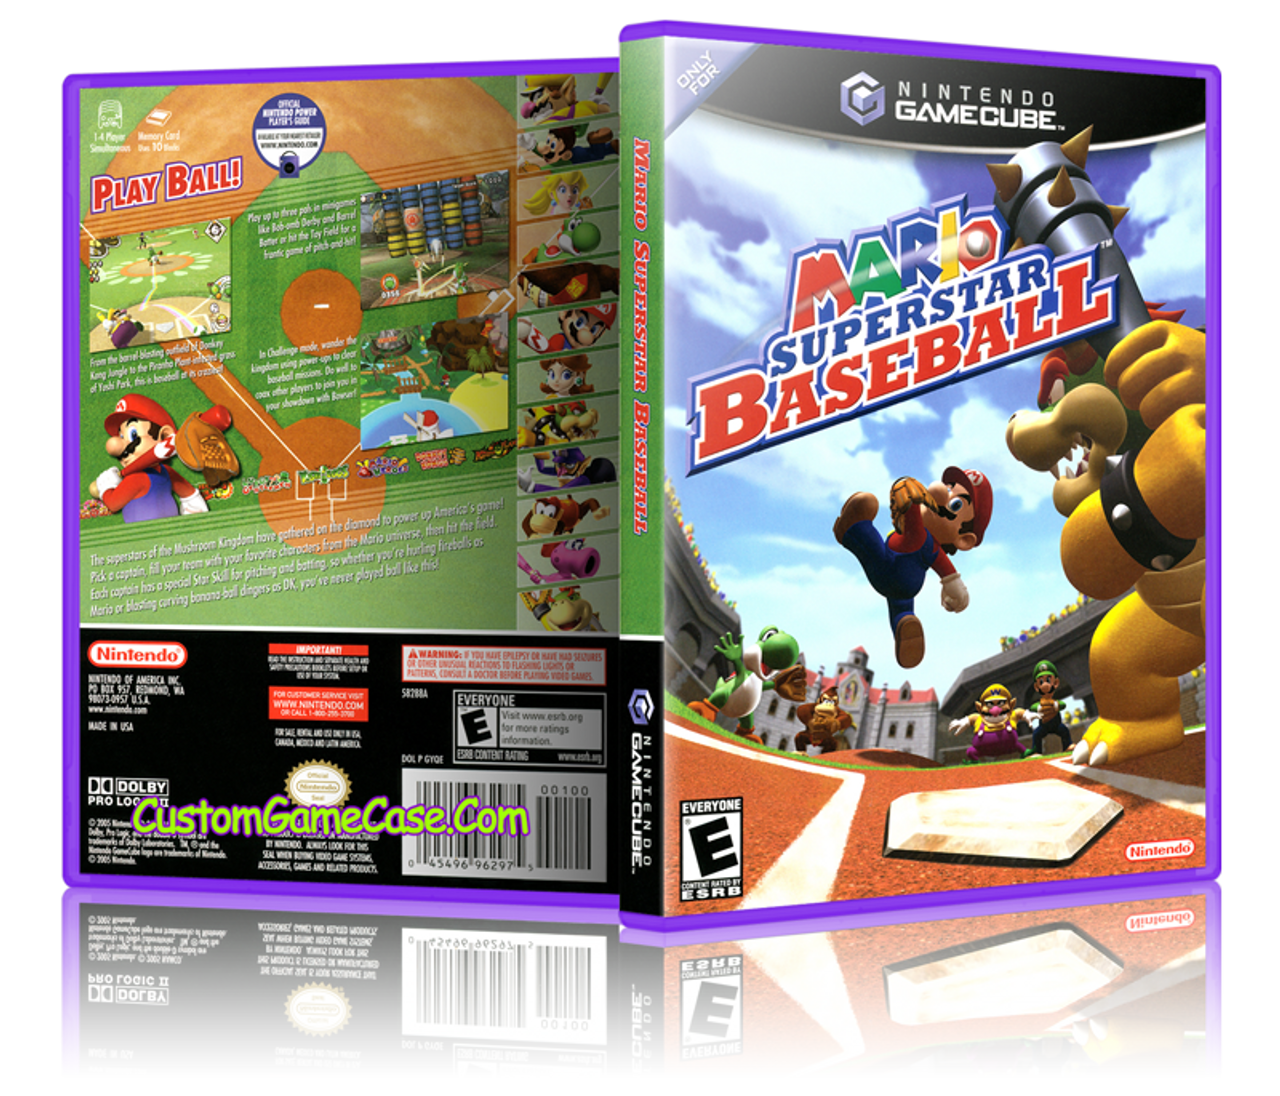 Mario Superstar Baseball Front Cover Artwork